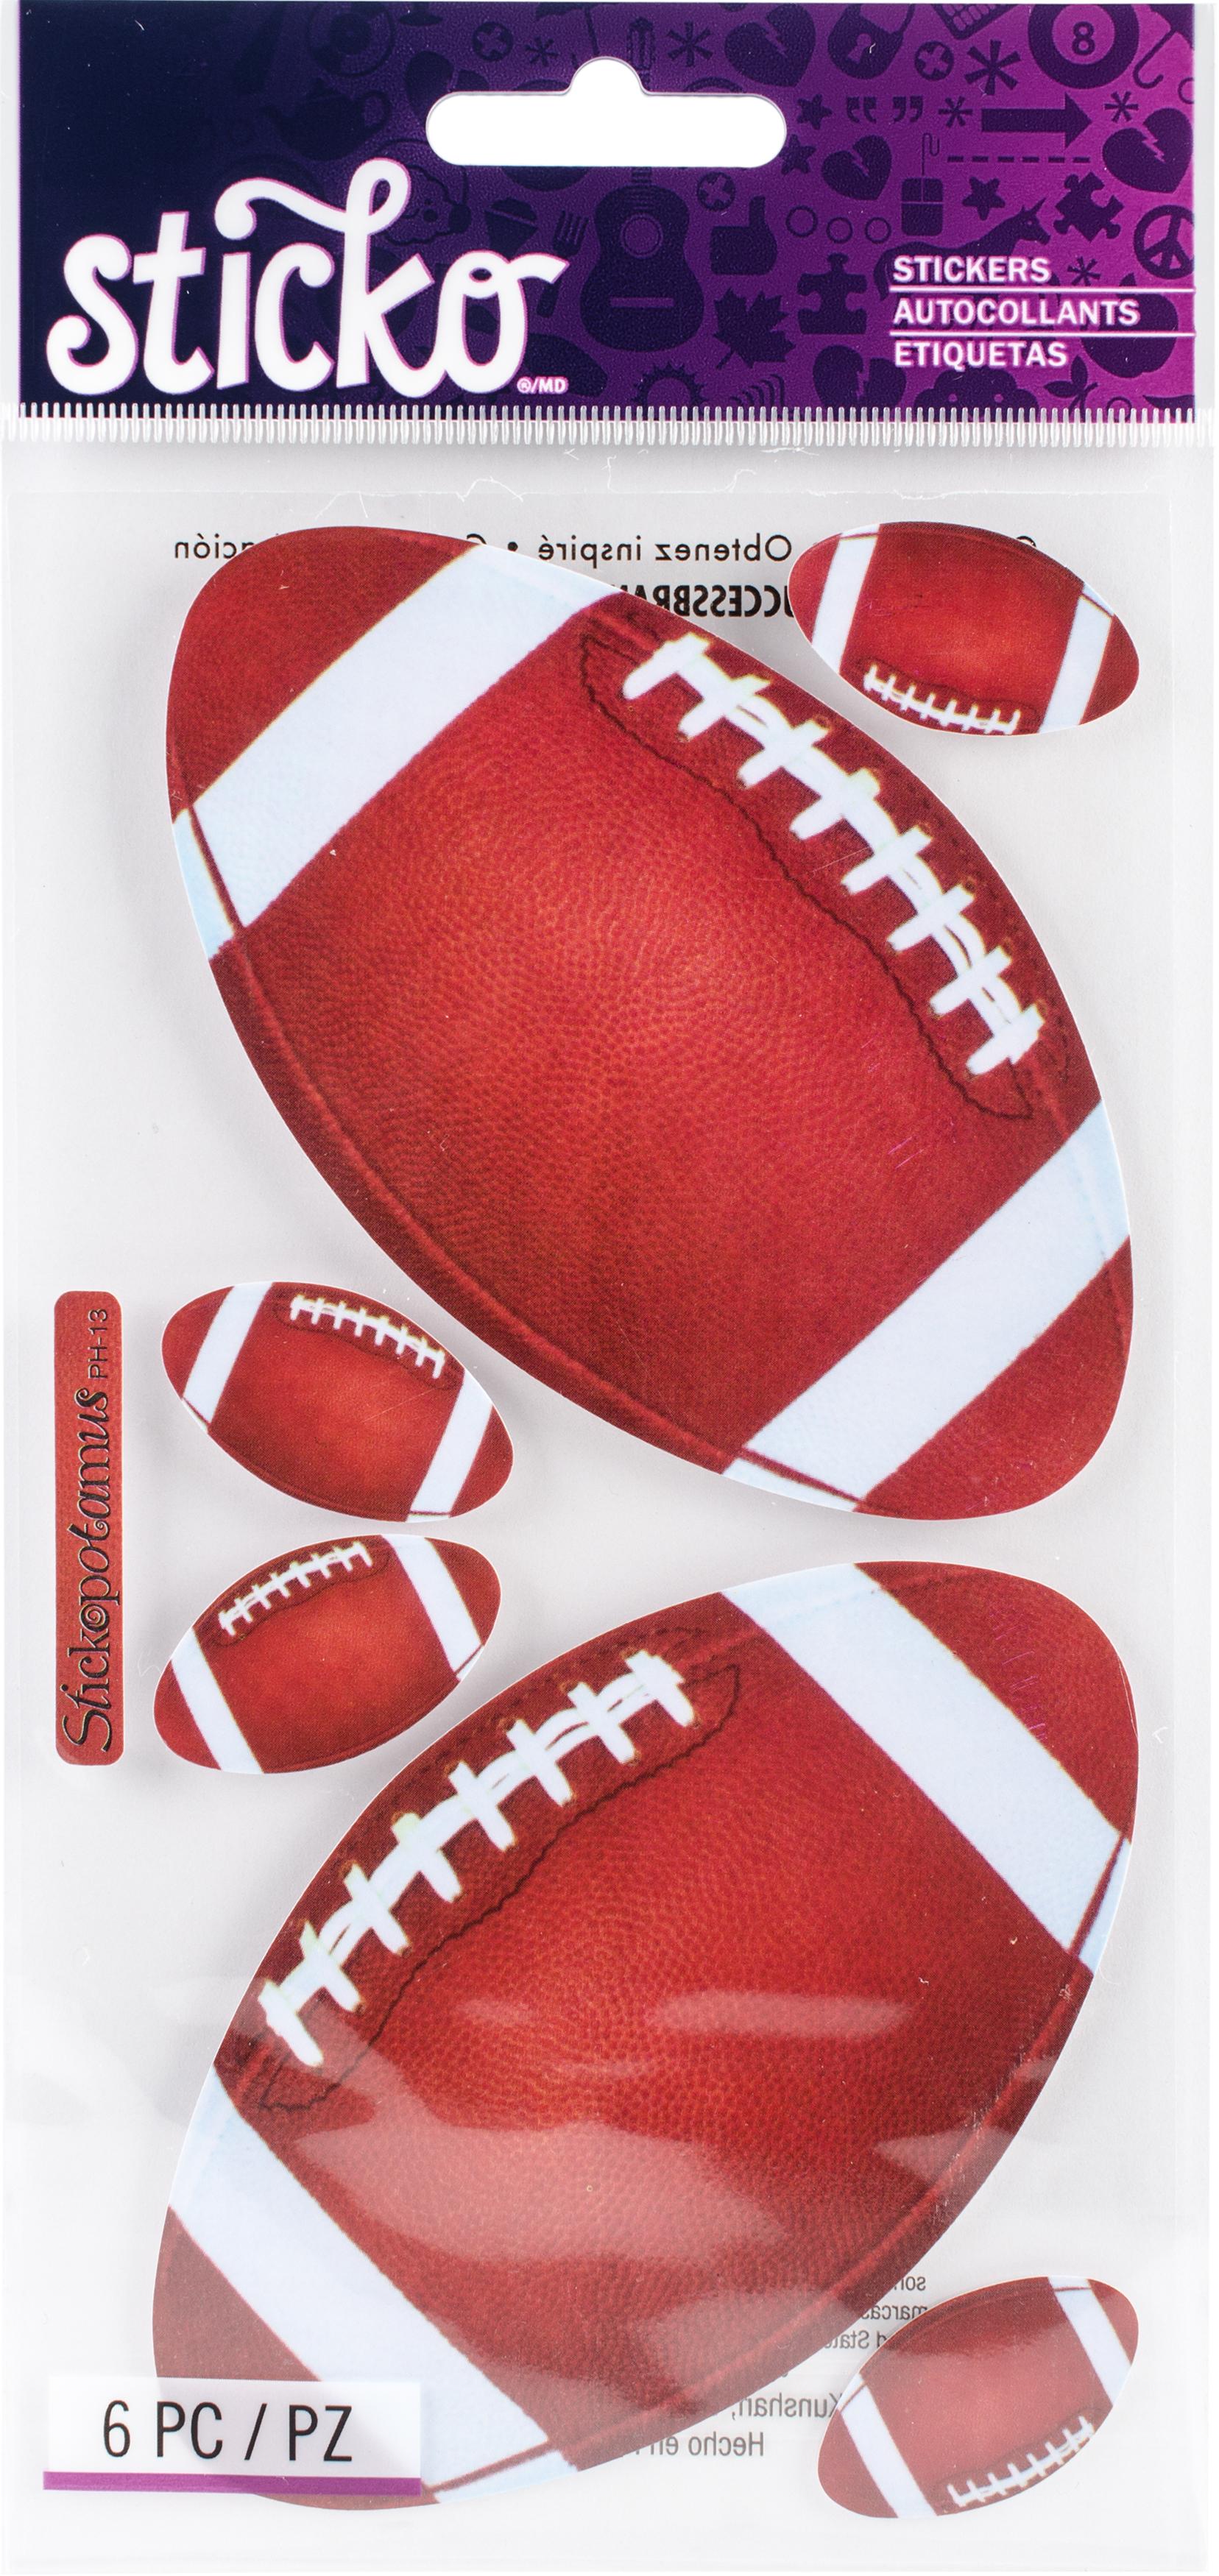 Sticko Football